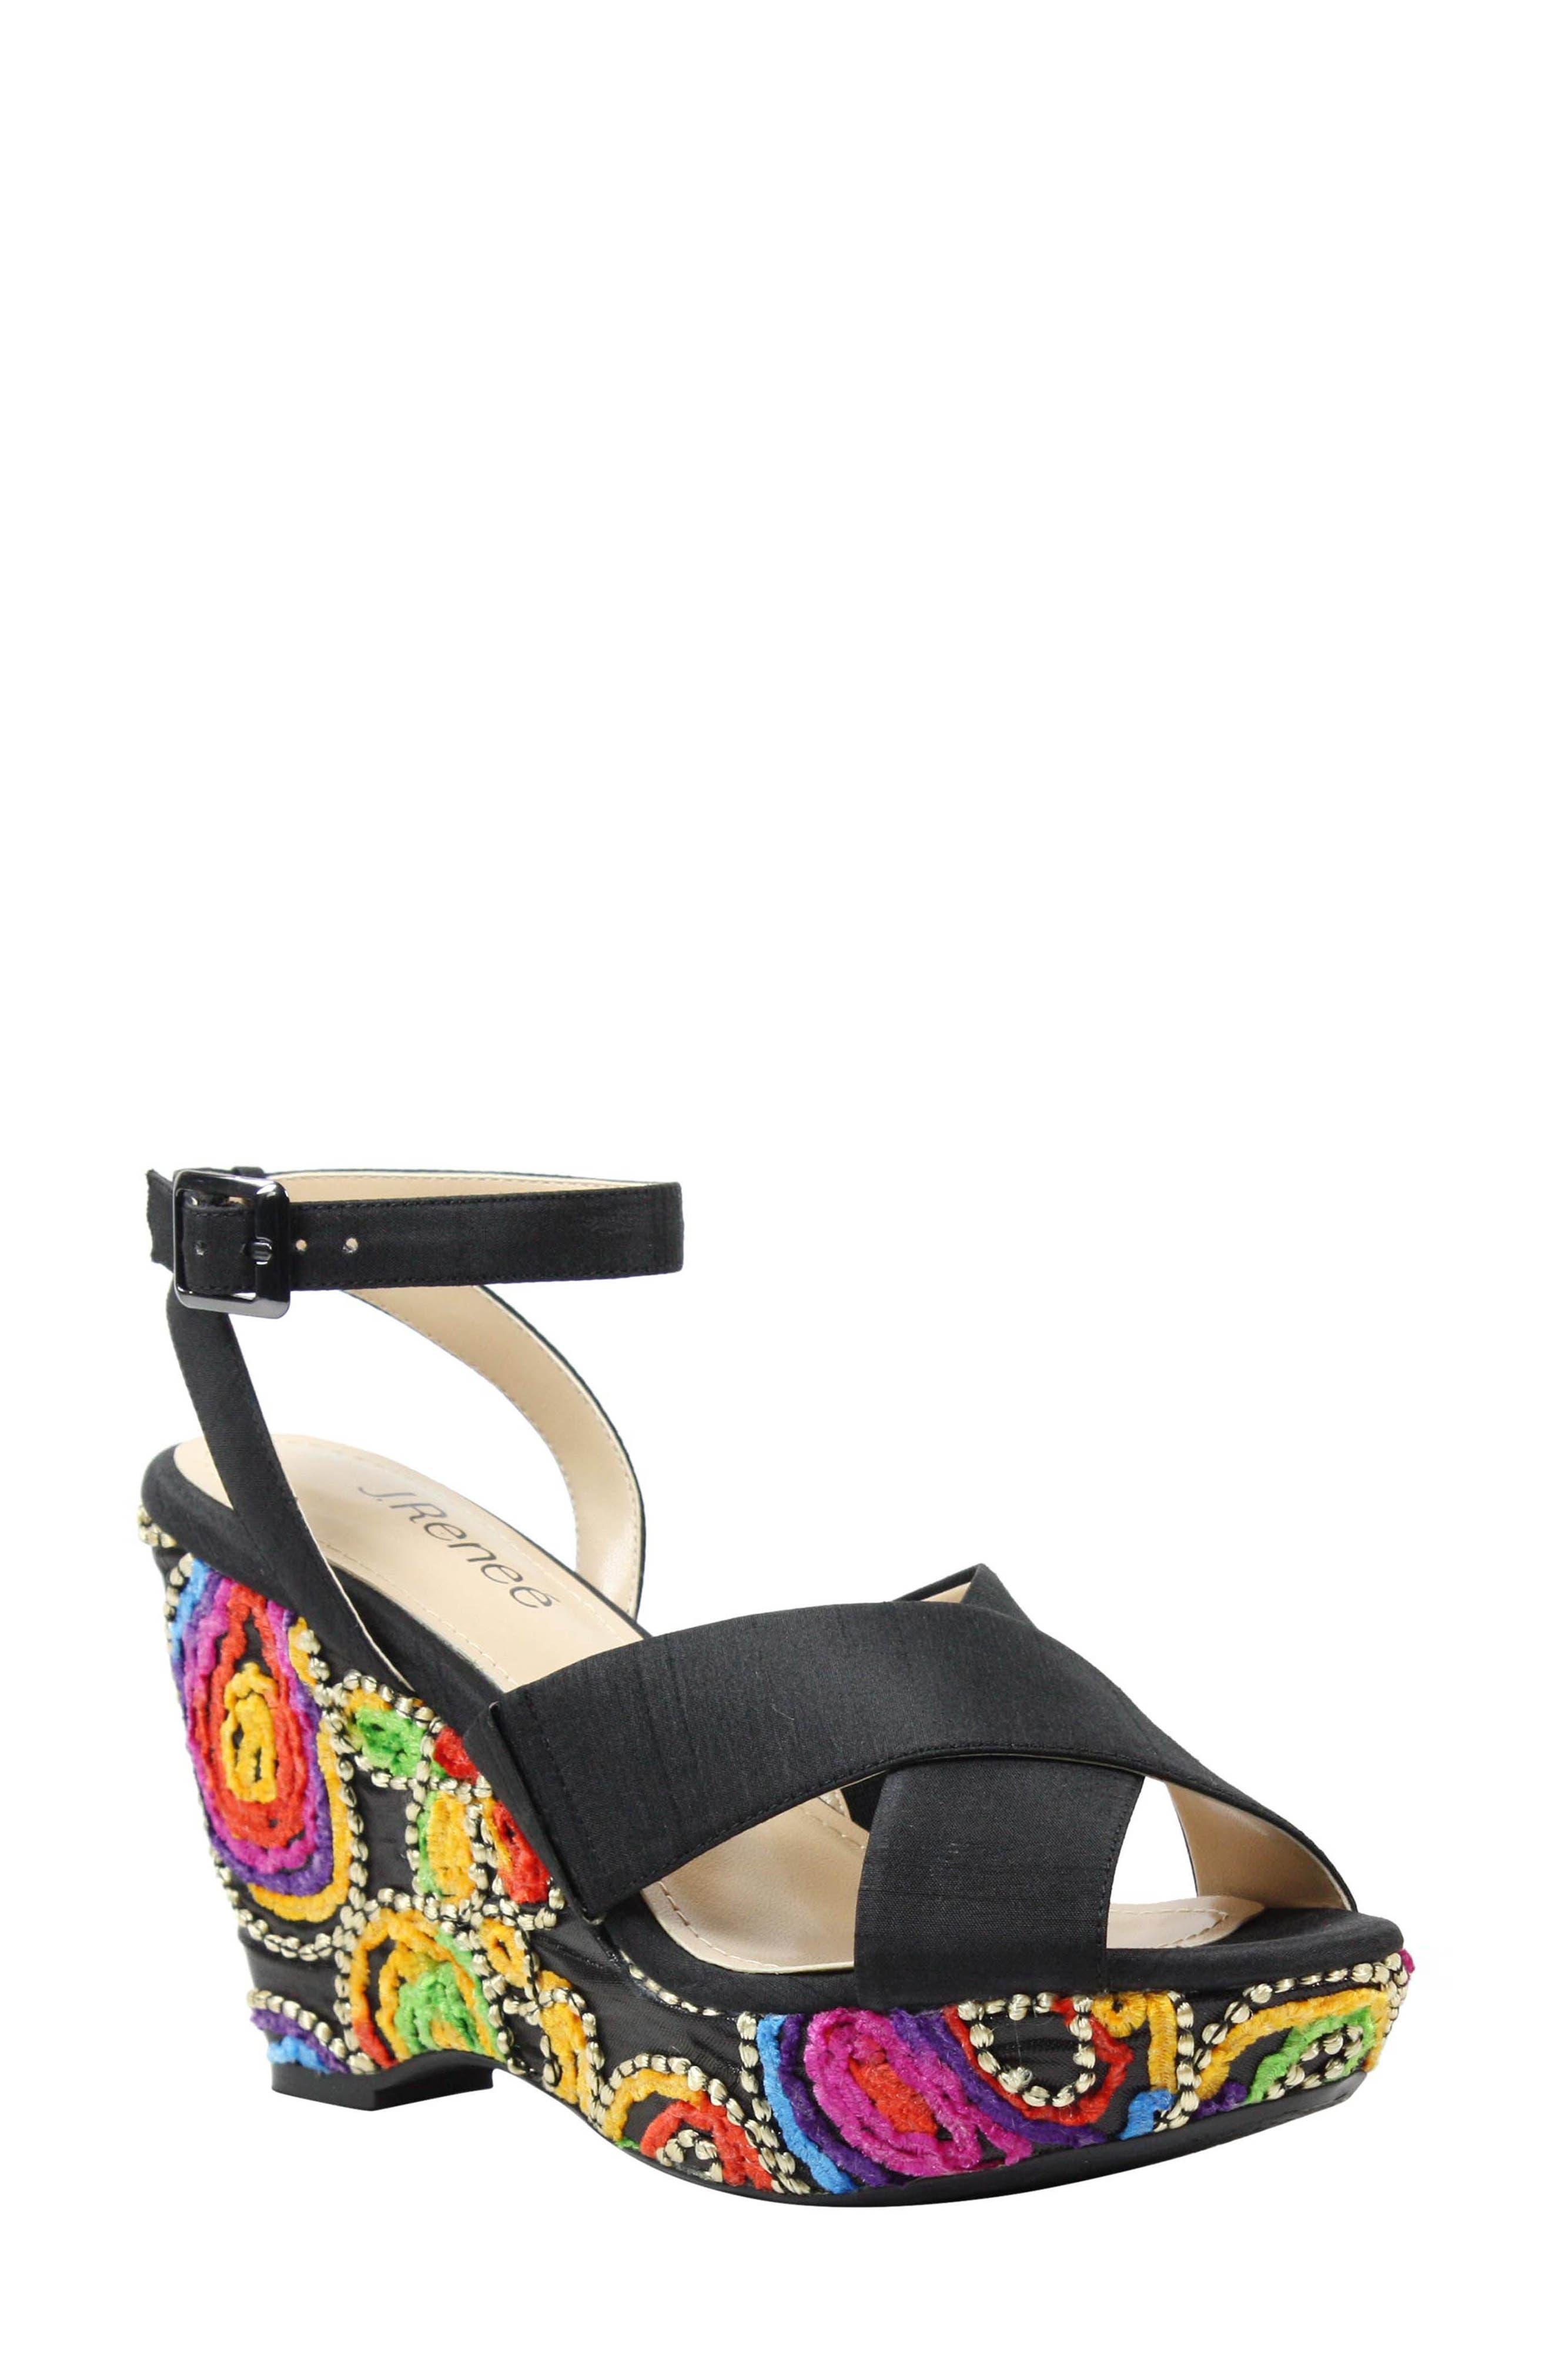 J. RENEÉ Viollette Wedge Sandal, Main, color, 001